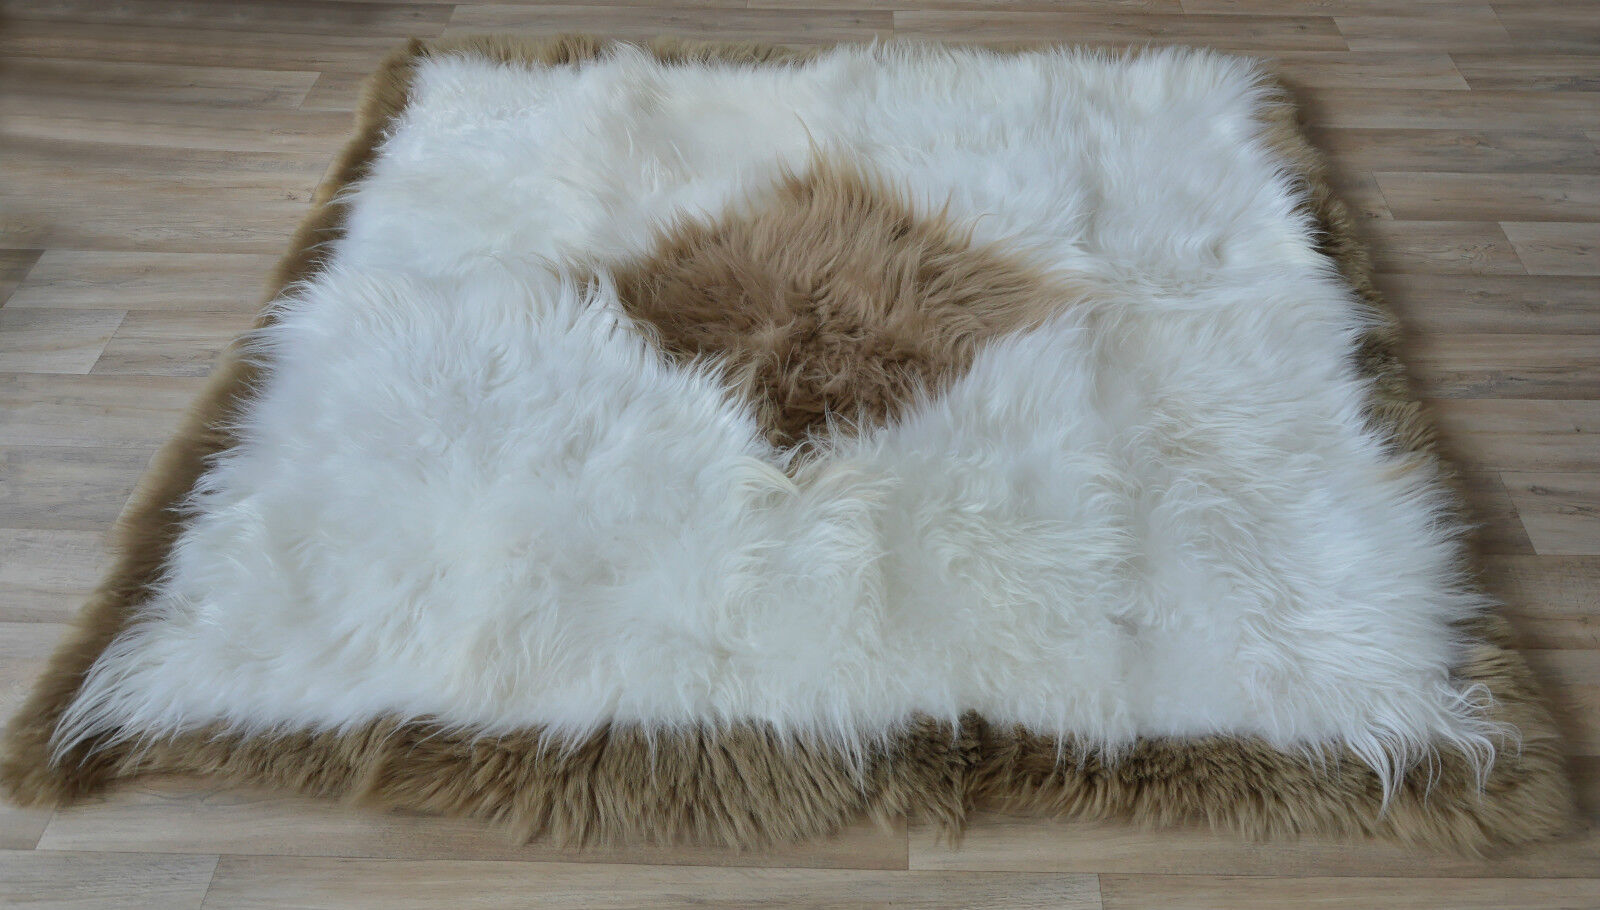 exklusiv island lammfell teppich wei braun 180 cm x 180. Black Bedroom Furniture Sets. Home Design Ideas